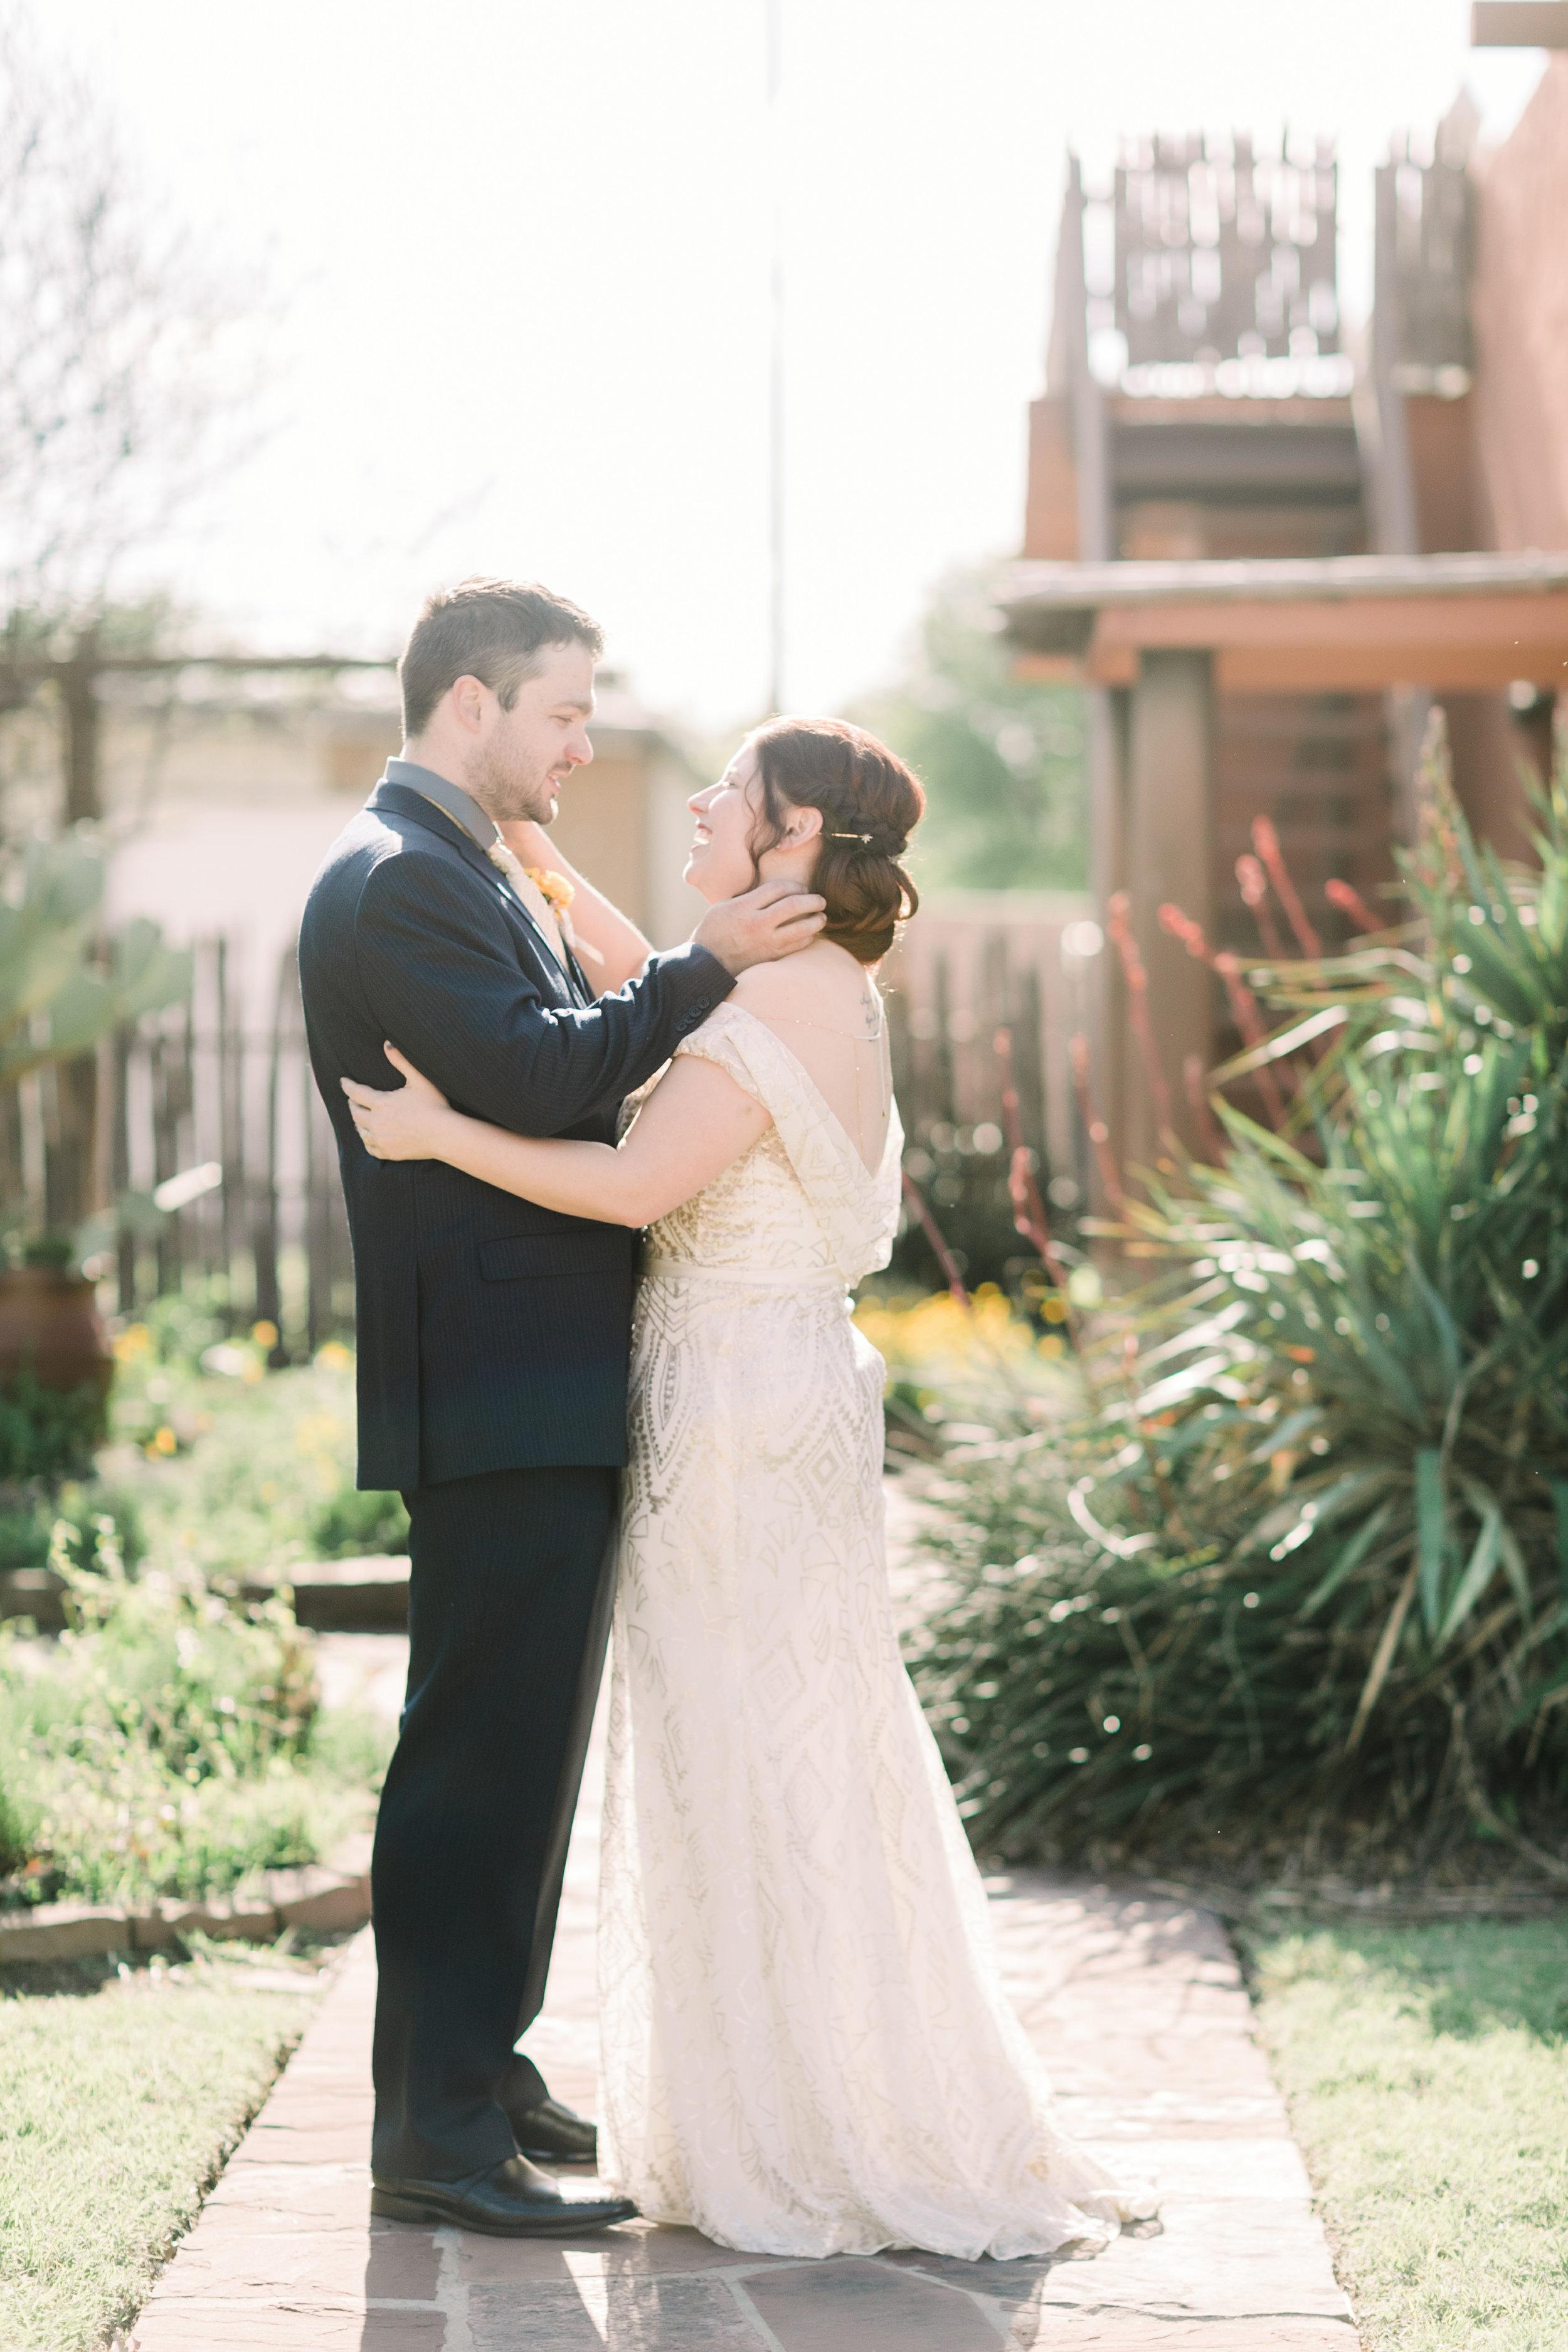 the-rock-barn-henrietta-wedding-photographer-texas-wichita-falls-earth-day-wedding-012.jpg